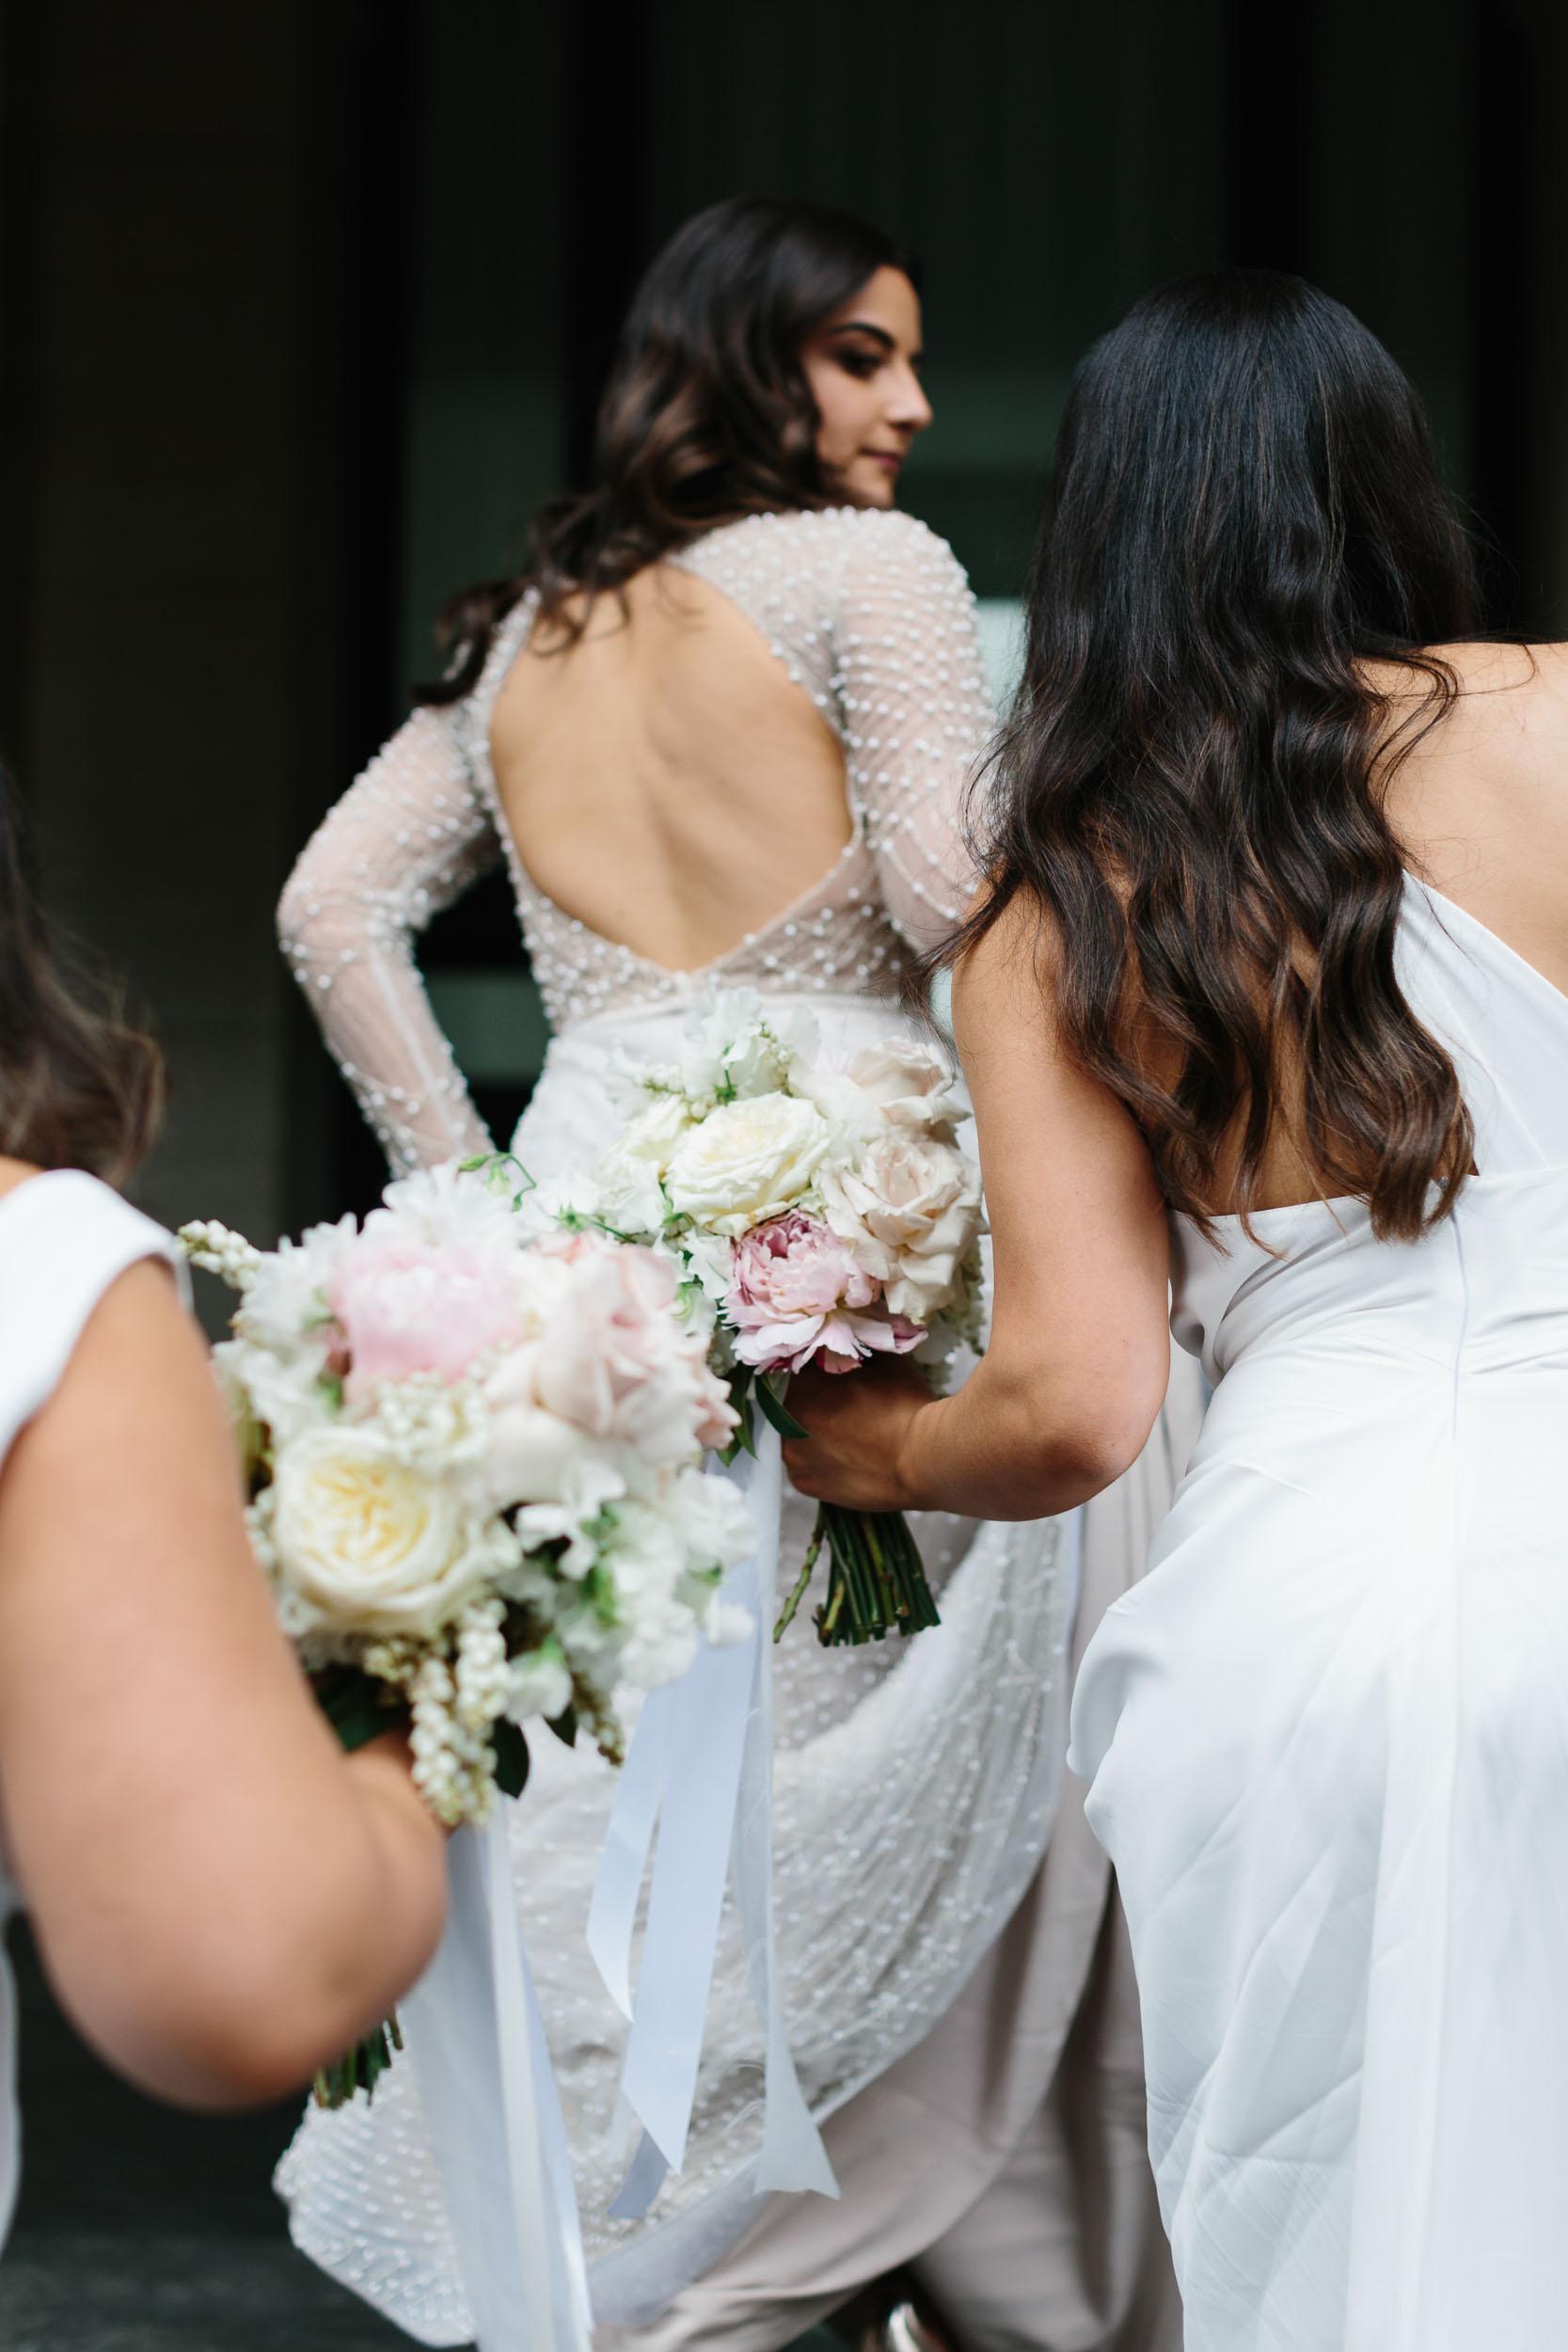 Kas-Richards-Wedding-Photographer-Melbourne-City-Wedding-Alto-Event-Space-Jane-Hill-Bridal-Gown-46.jpg